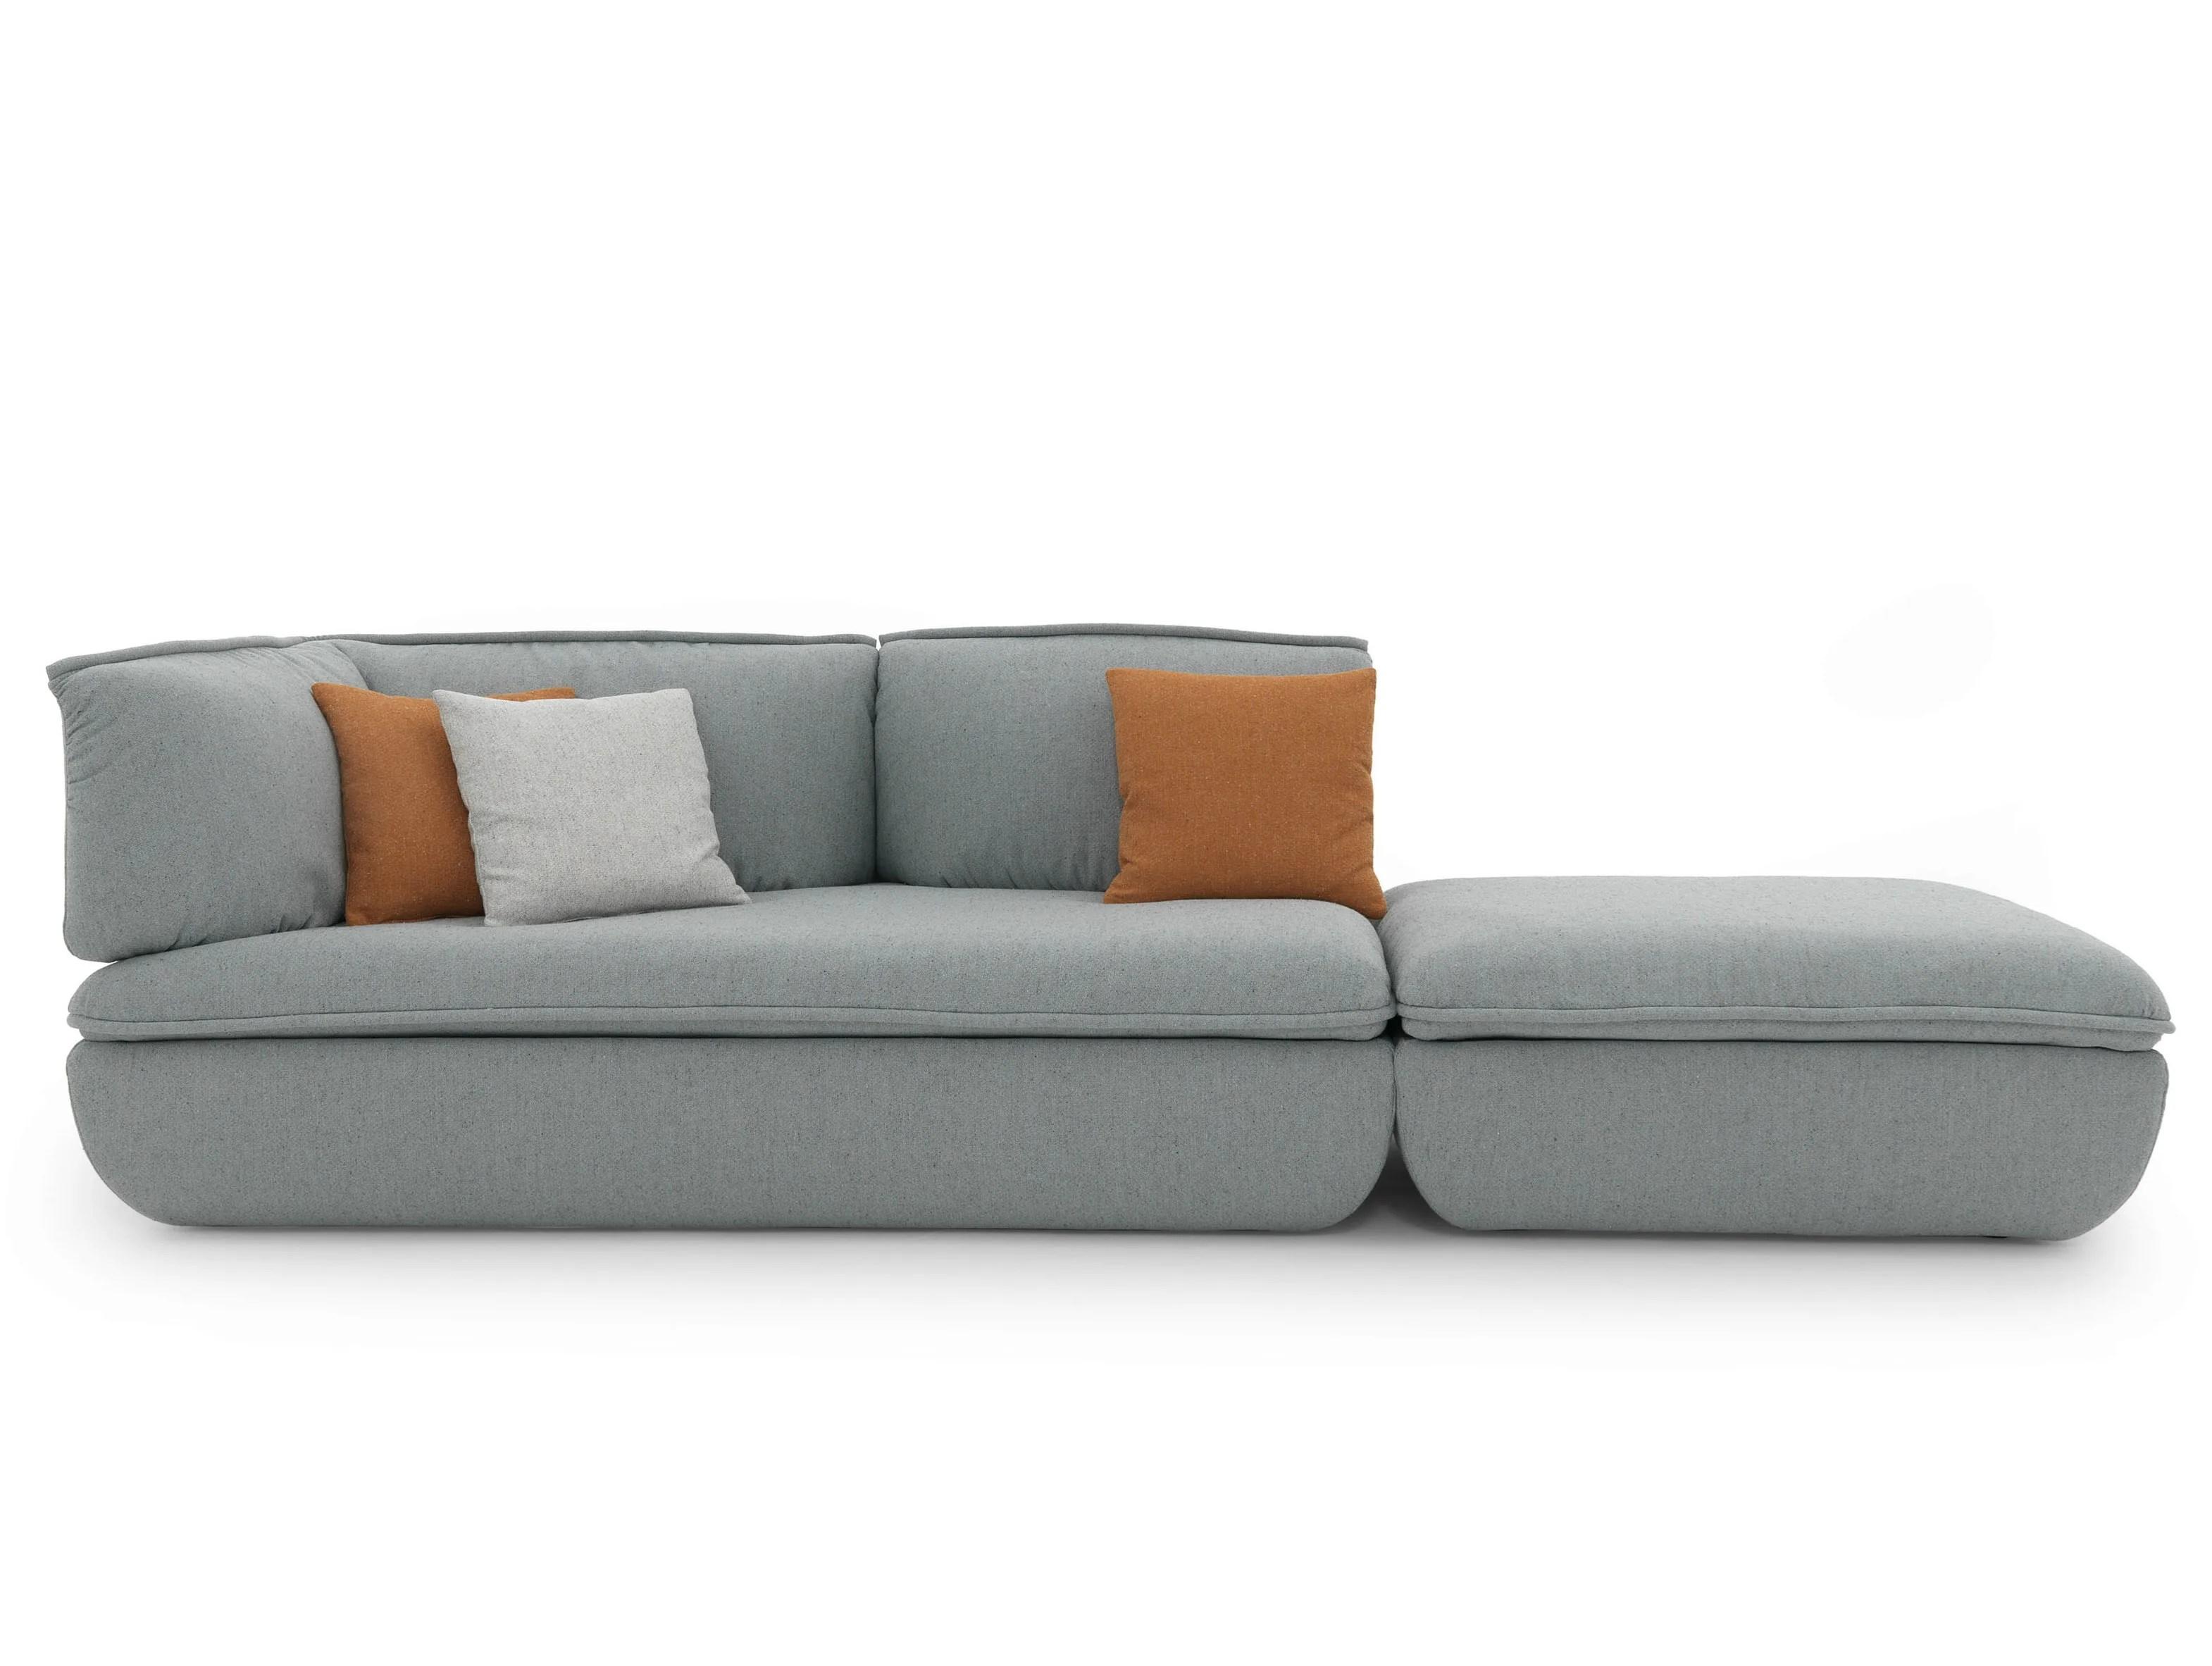 the sofa factory reviews leg lifters company santa monica